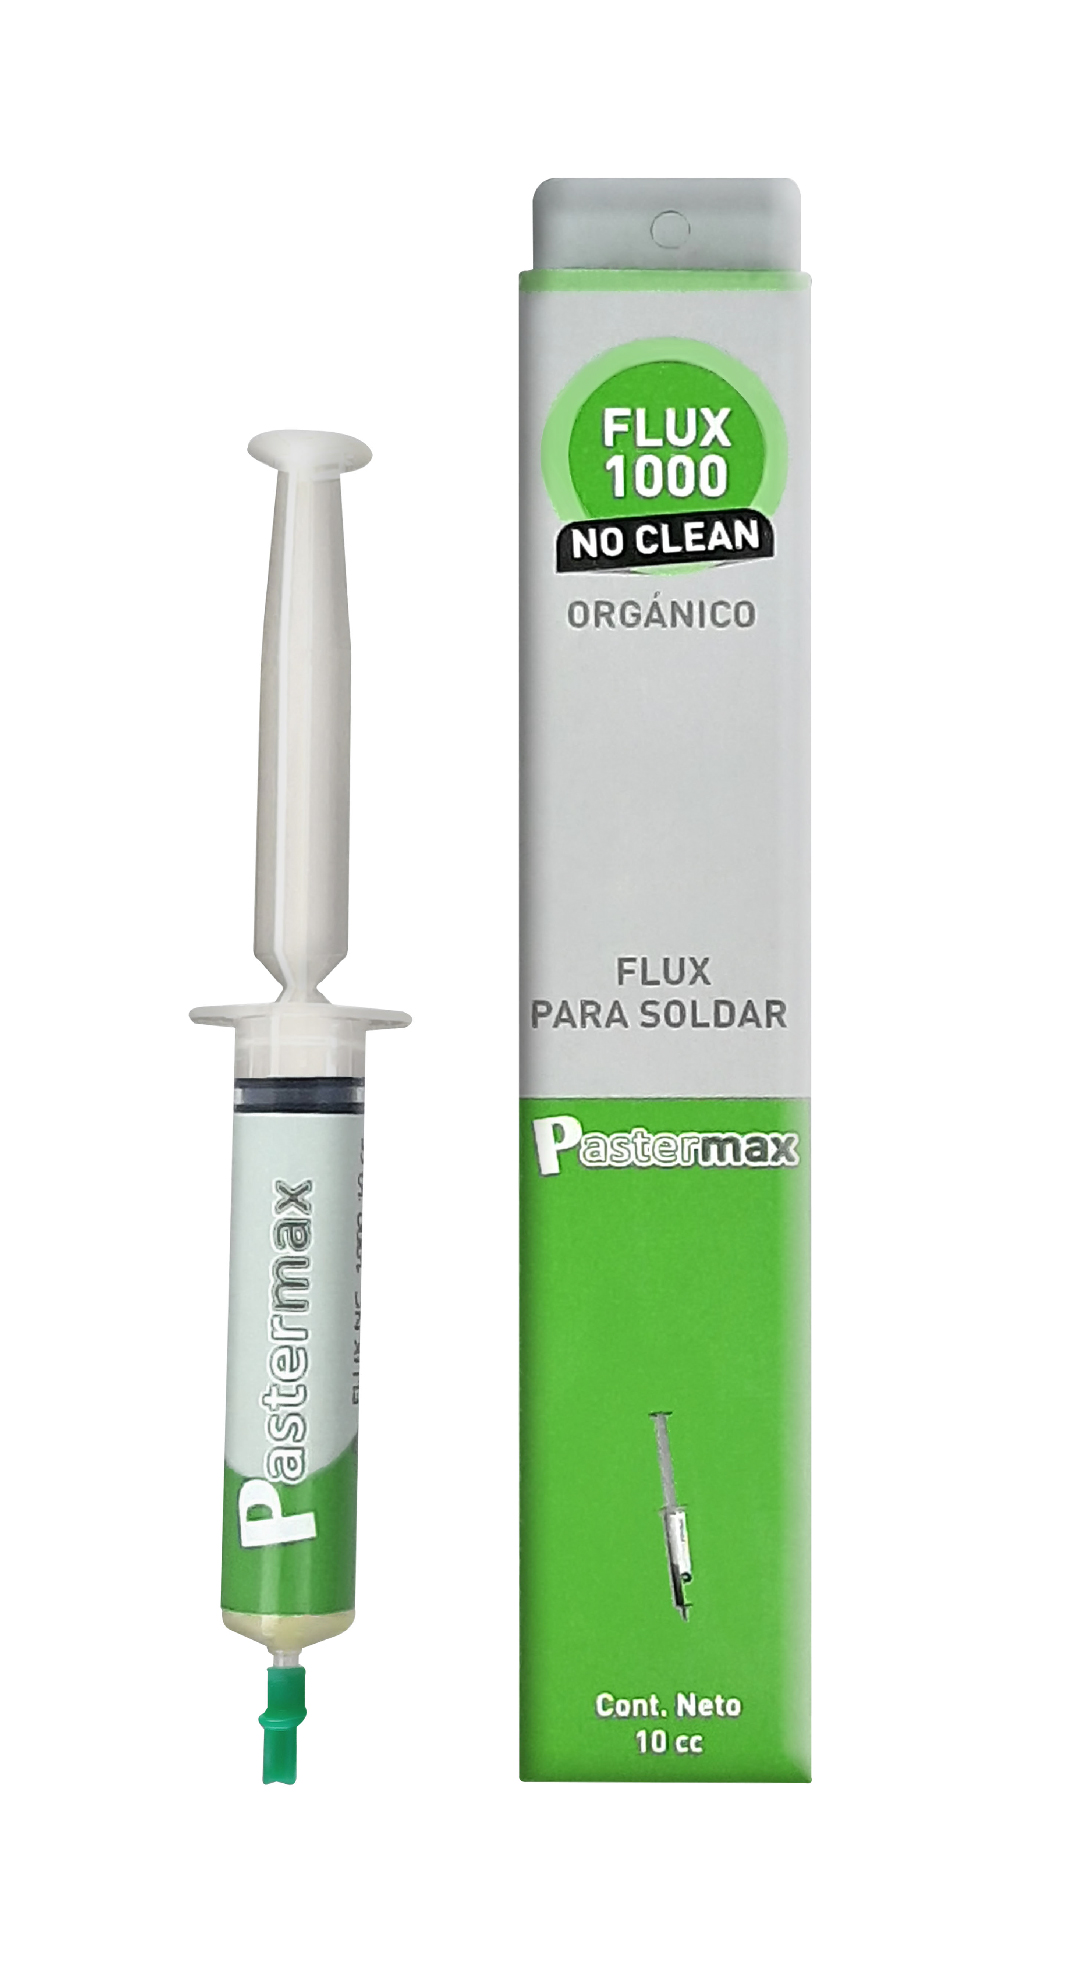 flux1000 pastermax